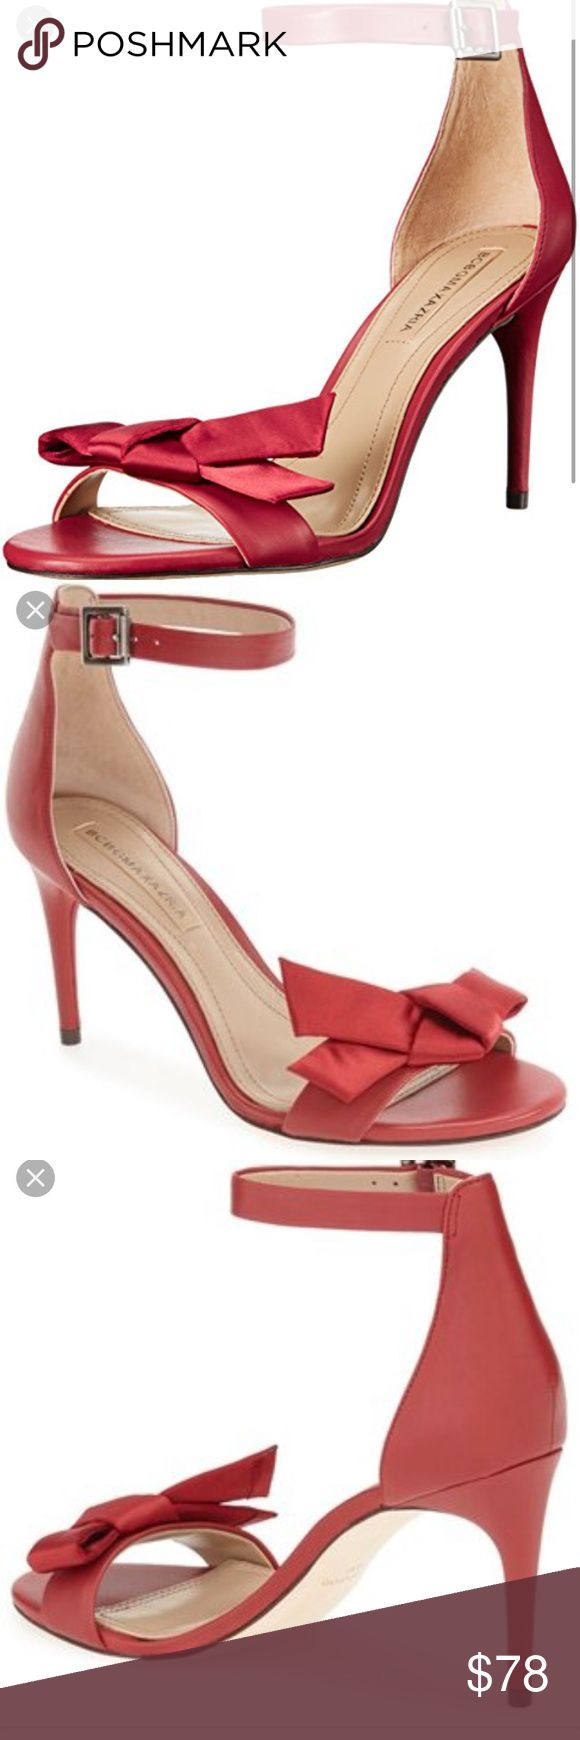 BCBGMAXAZRIA size 8M BCBGMAXAZRIA style ma-Pavli size 8M Shoes Sandals